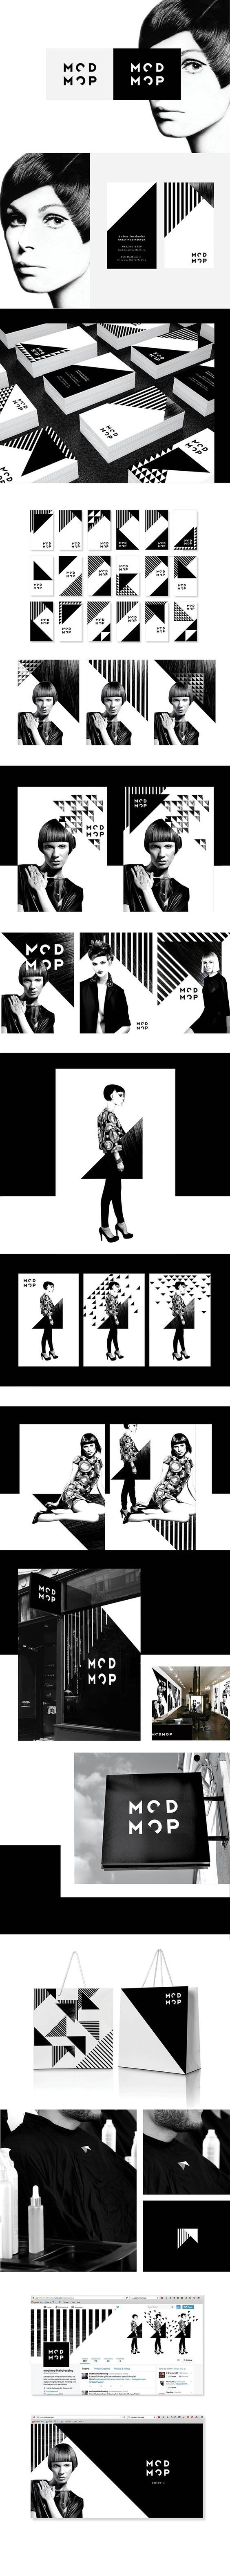 Modmop High-end Salon Branding by Alex Nereuta | Fivestar Branding Agency – Design and Branding Agency & Curated Inspiration Gallery